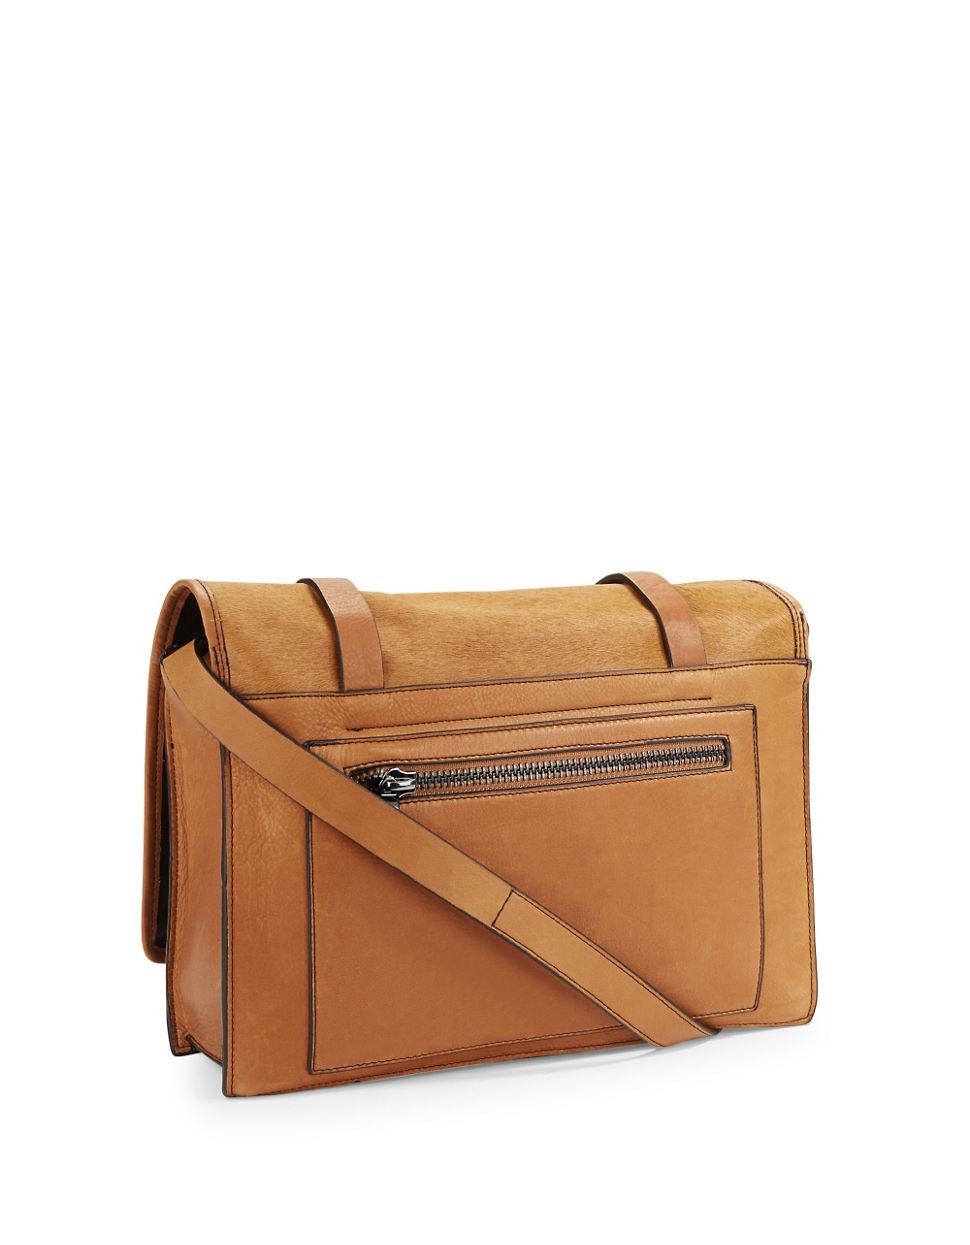 Embellished Tan Calf Leather Messenger Bag vuZSz